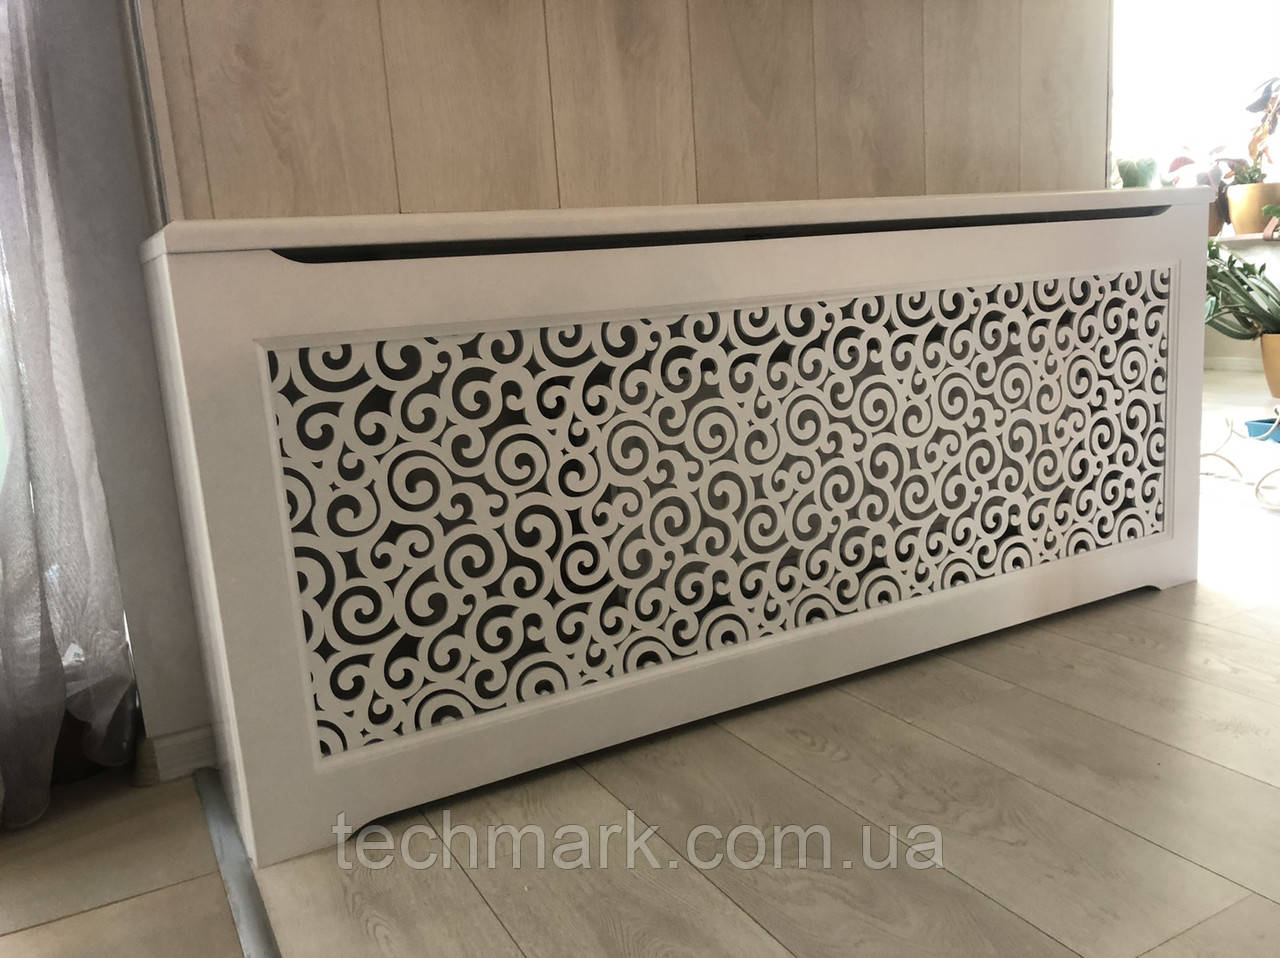 Декоративная решетка экран (короб) на батарею отопления R70-K